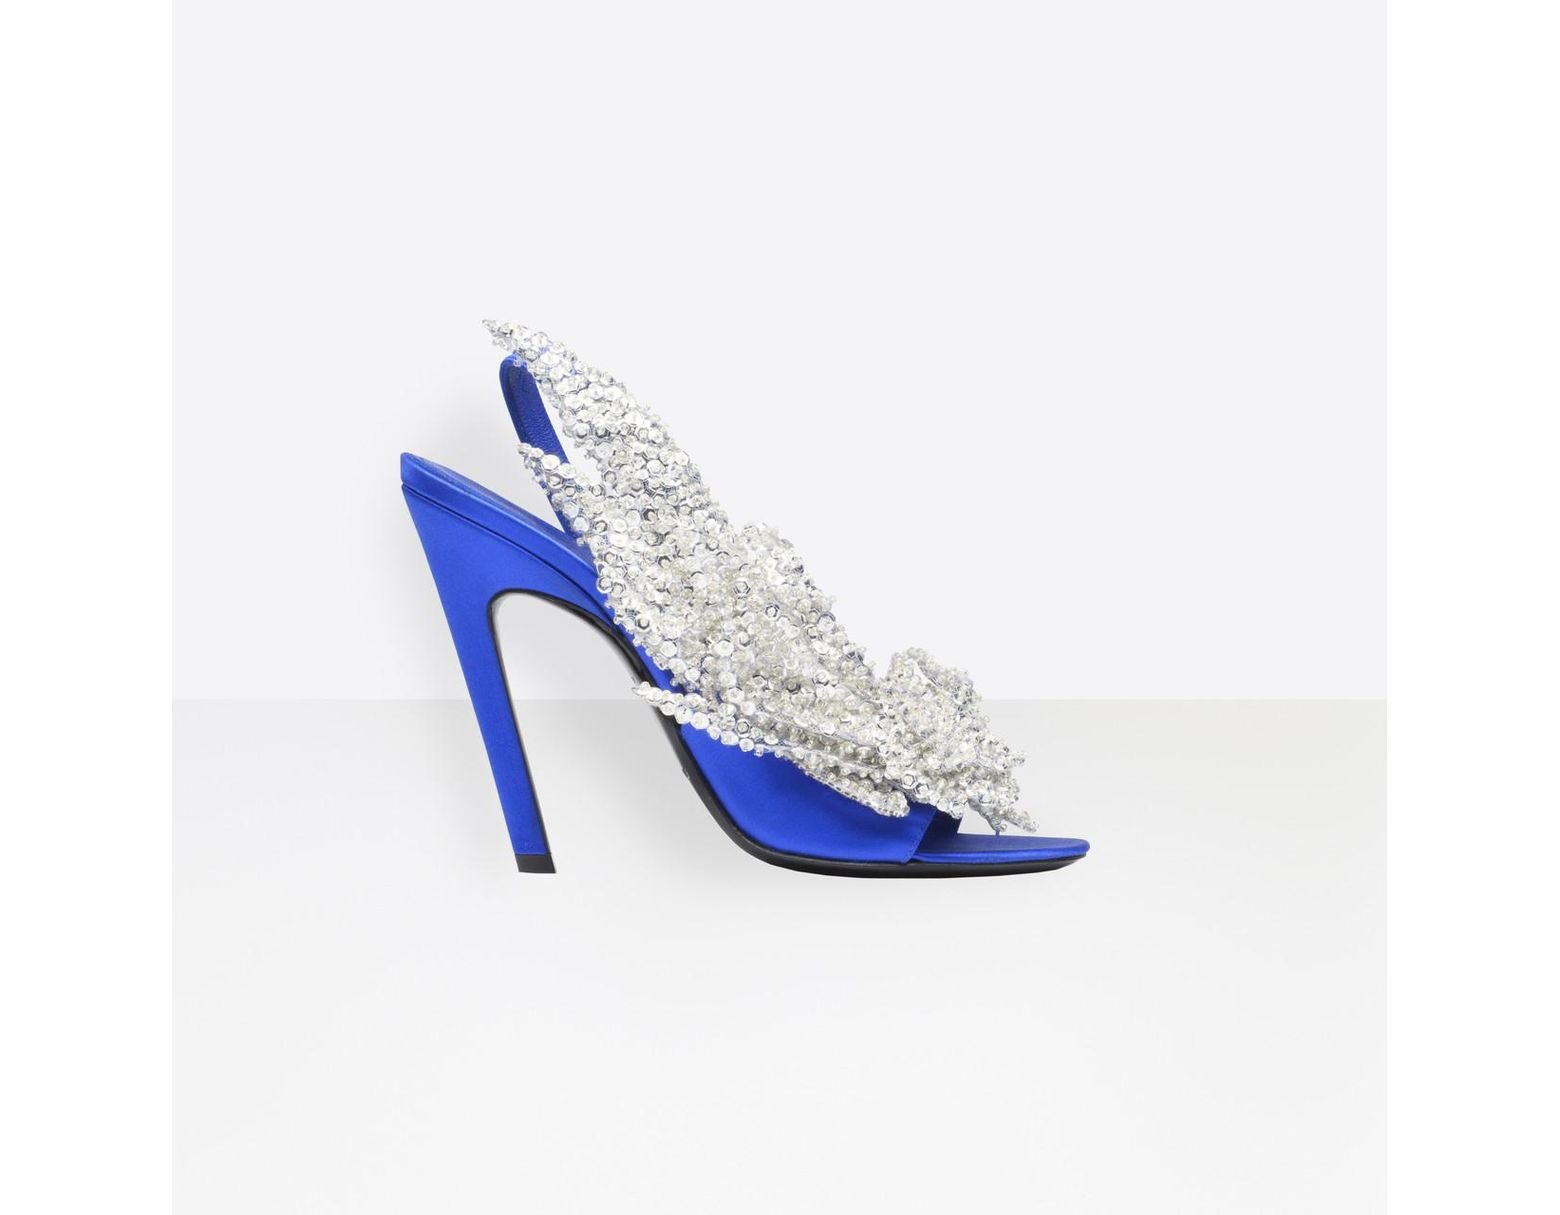 Slash Sandales De Talon Bleu Coloris Femme 0XOPk8nw